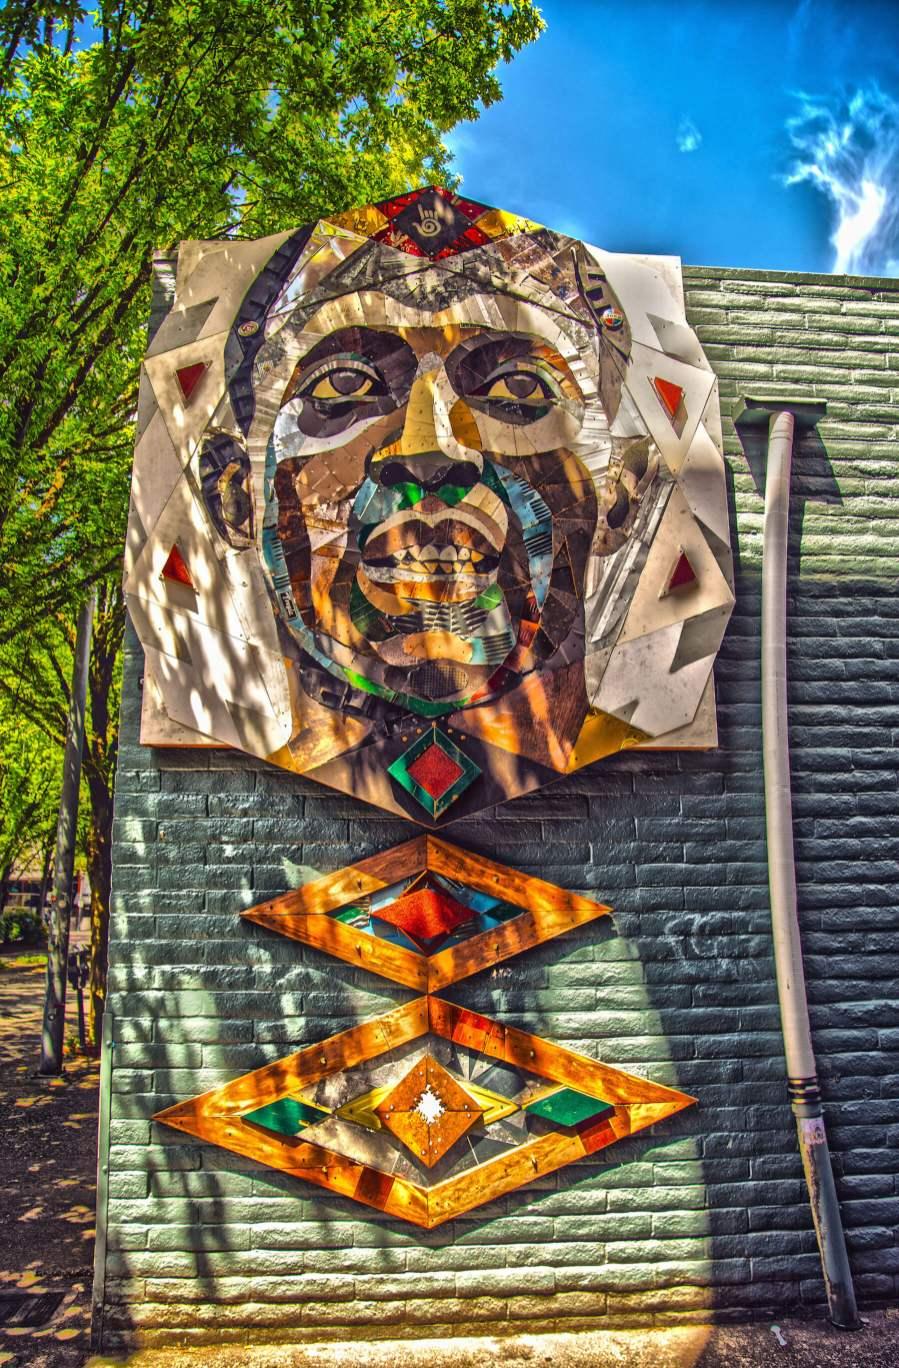 Matt Small, Jesse Owens Tribute, Re-claimed materials Sculpture, 20x21EUG Mural Project, Eugene, Oregon. Photo Credit Ben Schorzman